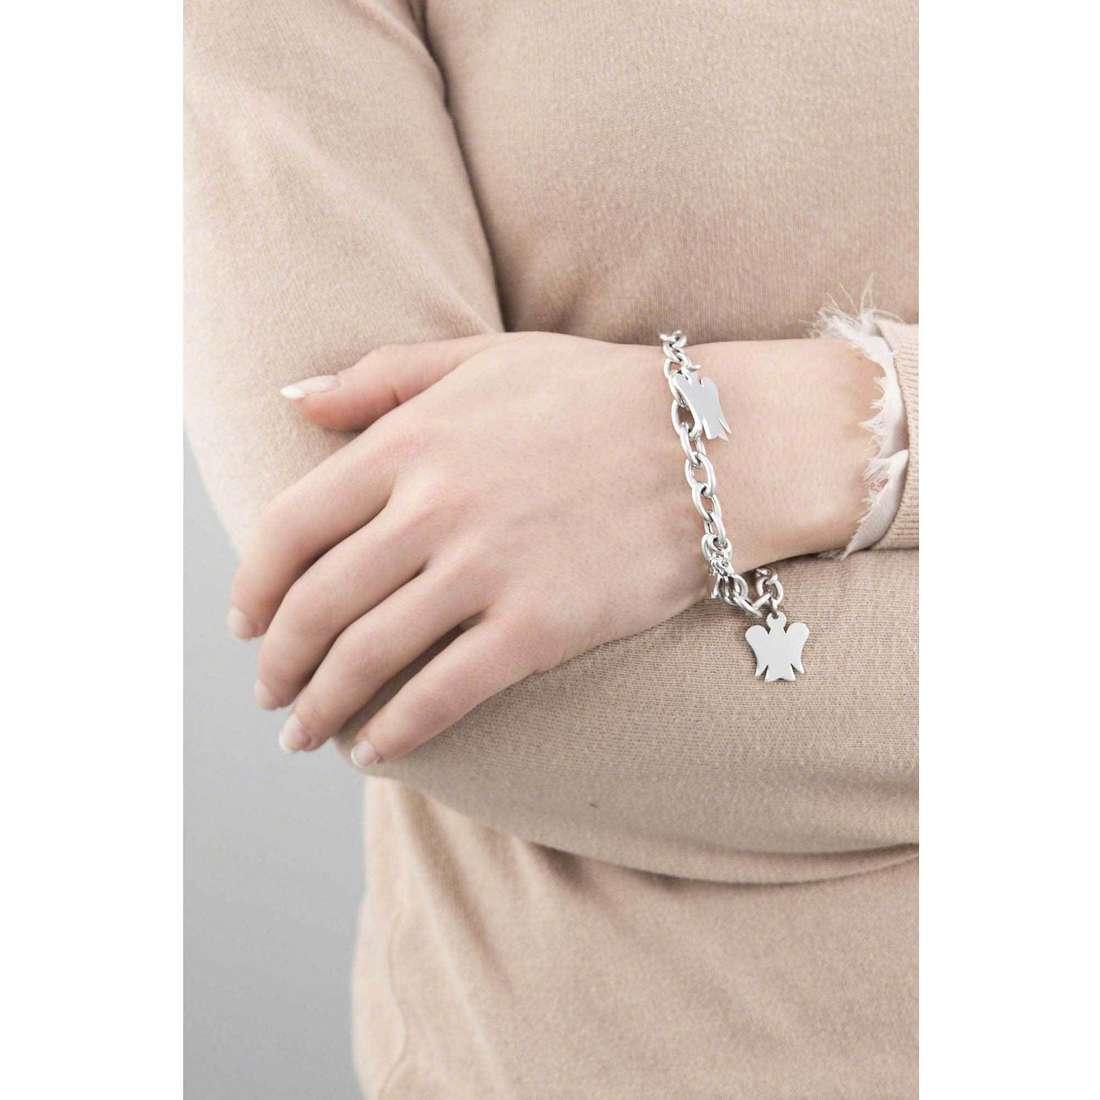 Giannotti bracelets Chiama Angeli femme GIA123 indosso